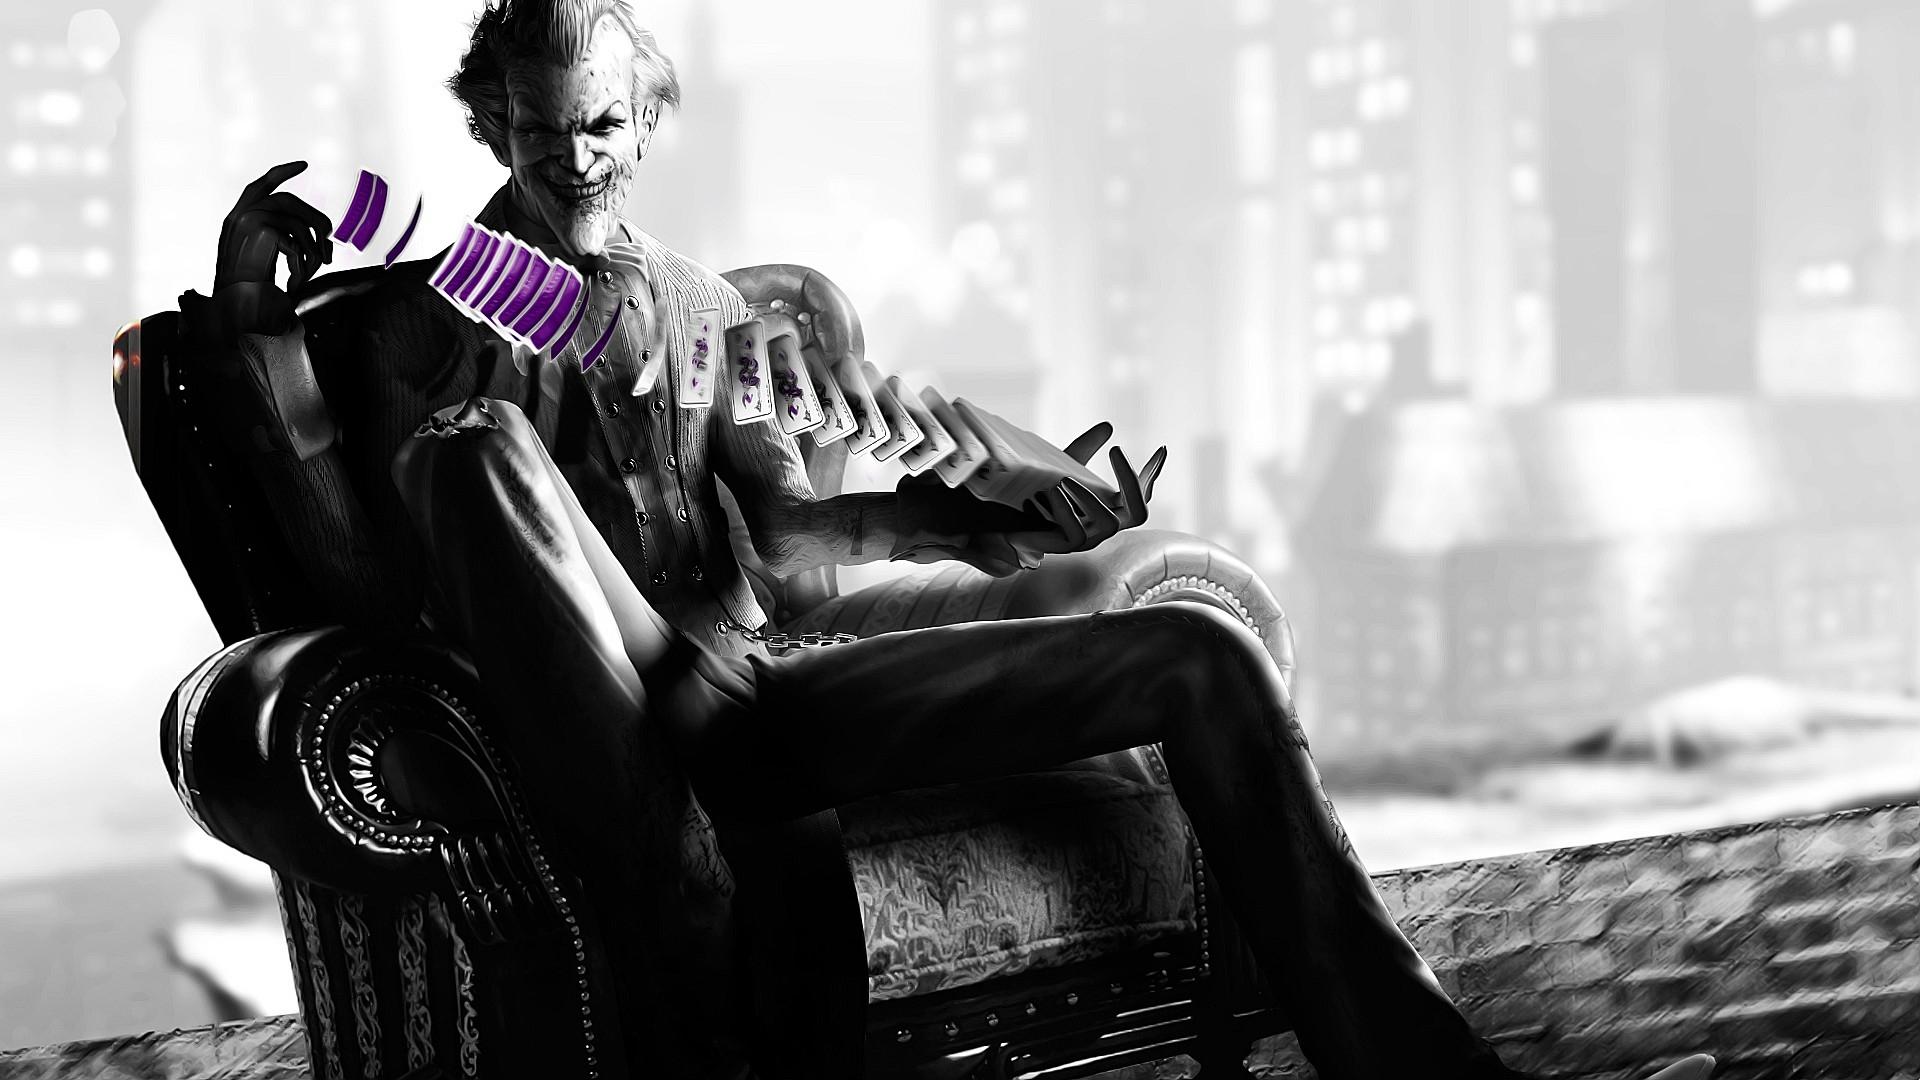 Download Wallpaper 1920x1080 Batman Arkham City The Joker